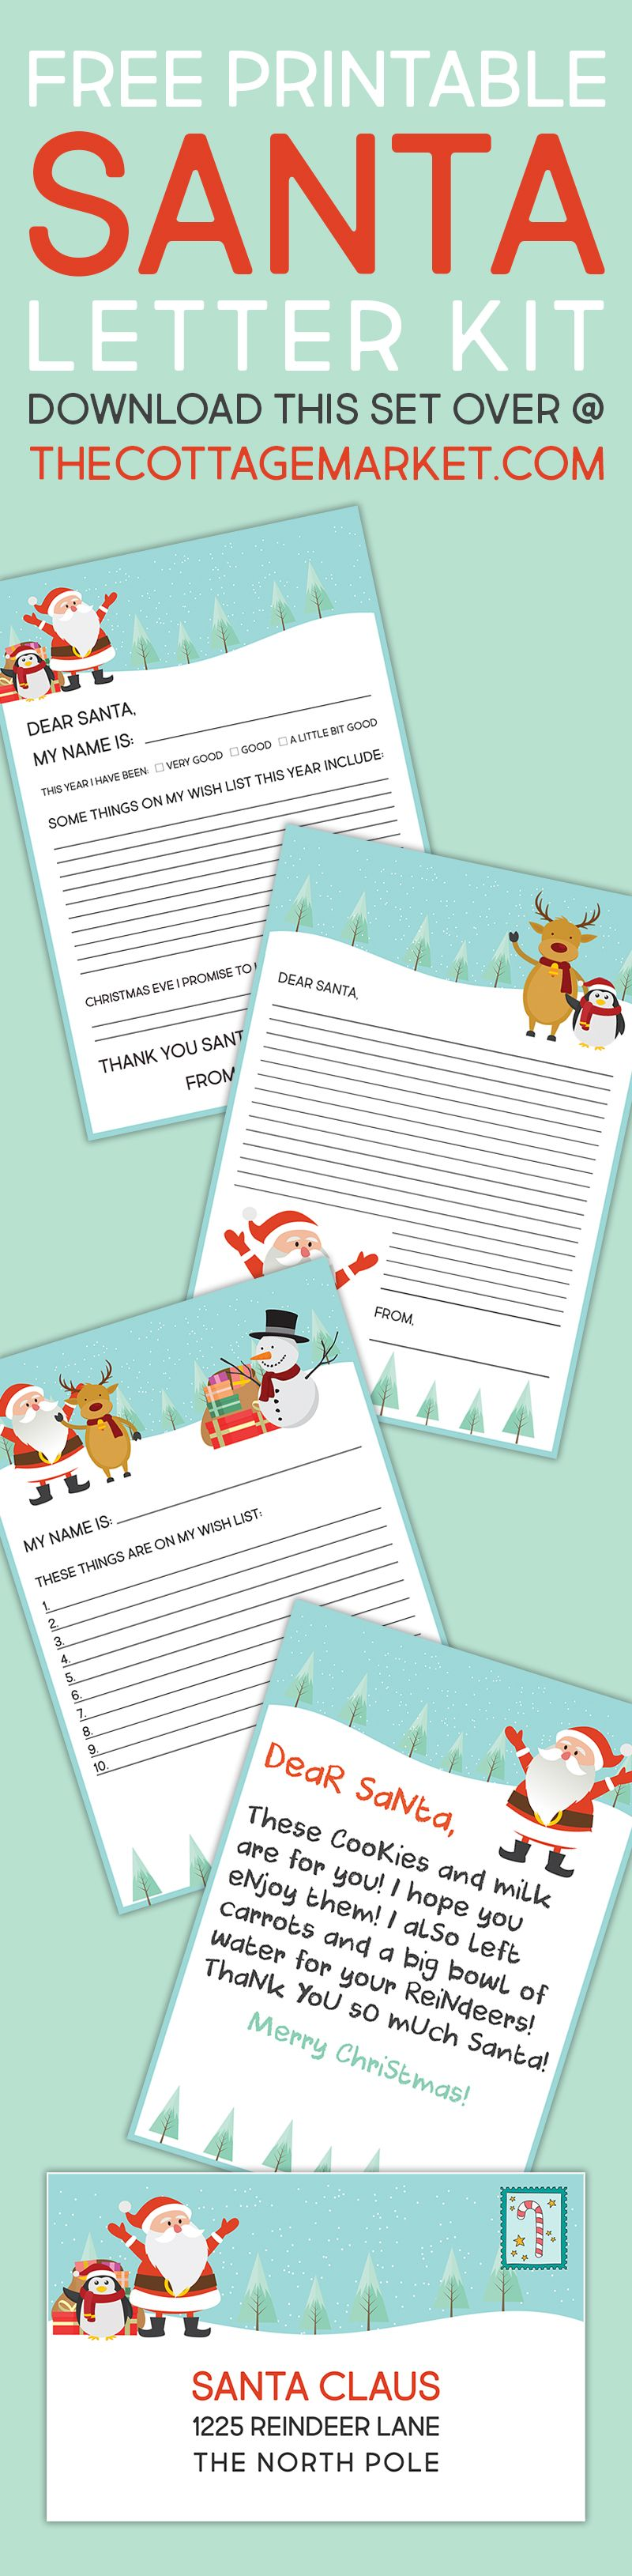 Free Printable Santa Letter Kit  Free Printable Santa Letters